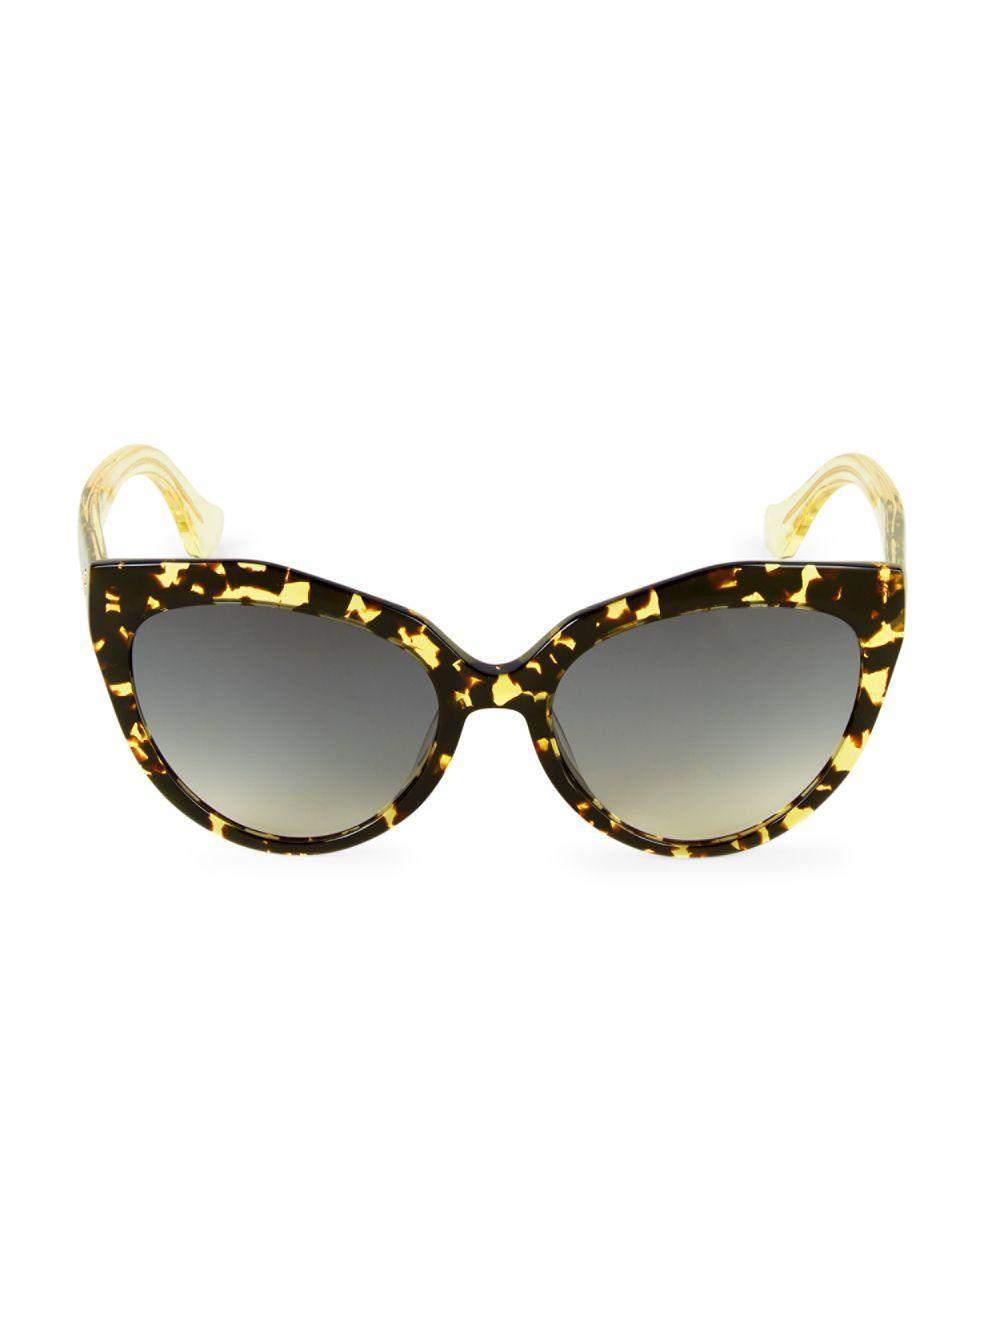 3ad5534f9e3 Lyst - Balenciaga 52mm Tortoiseshell Cateye Sunglasses in Brown